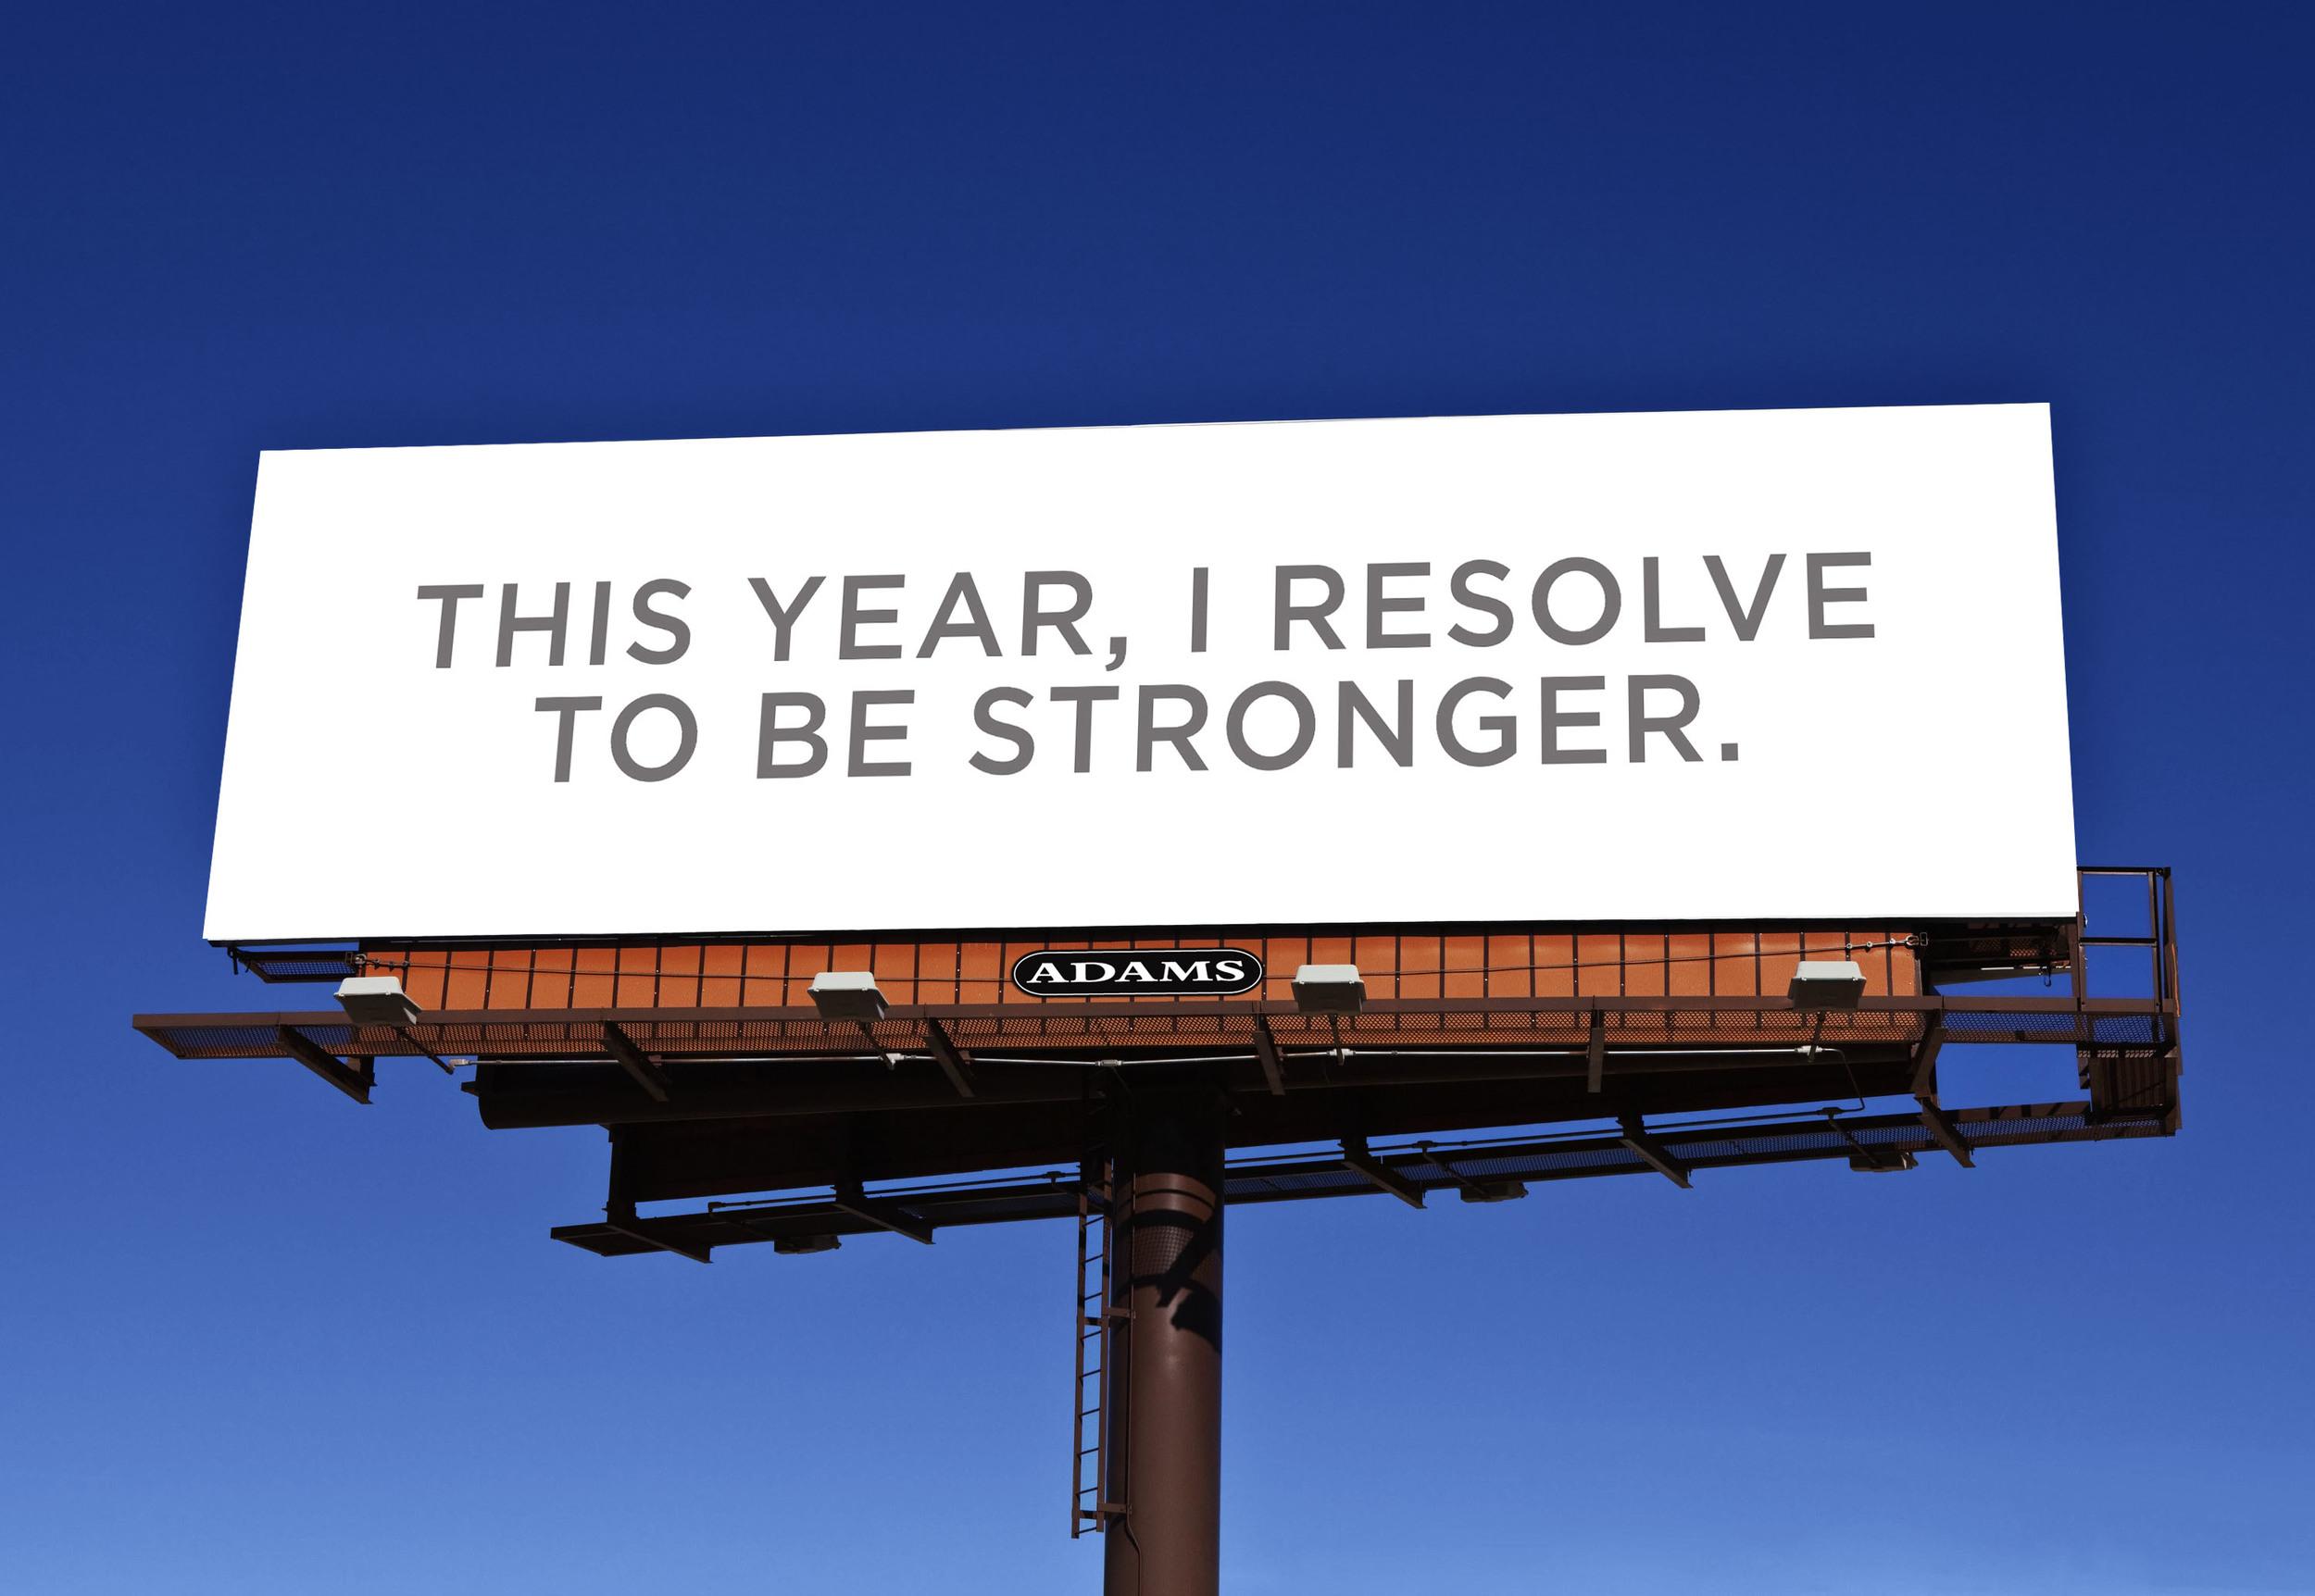 Adams_SC_Stronger_Tease.jpg